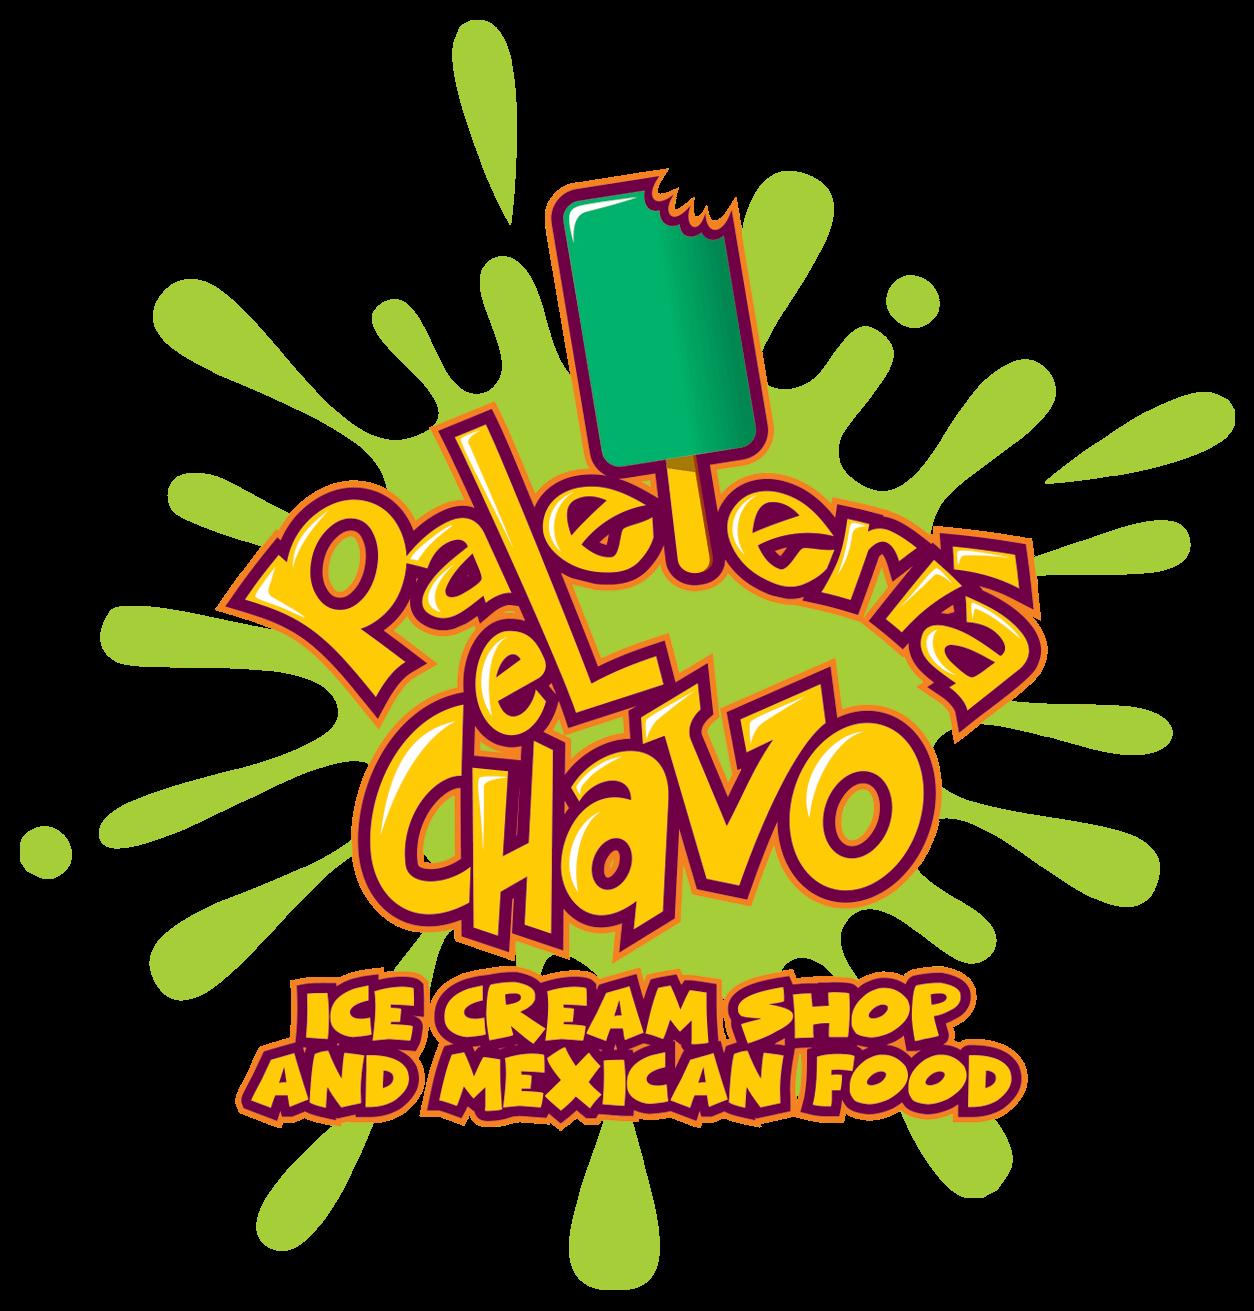 Paleteria El Chavo